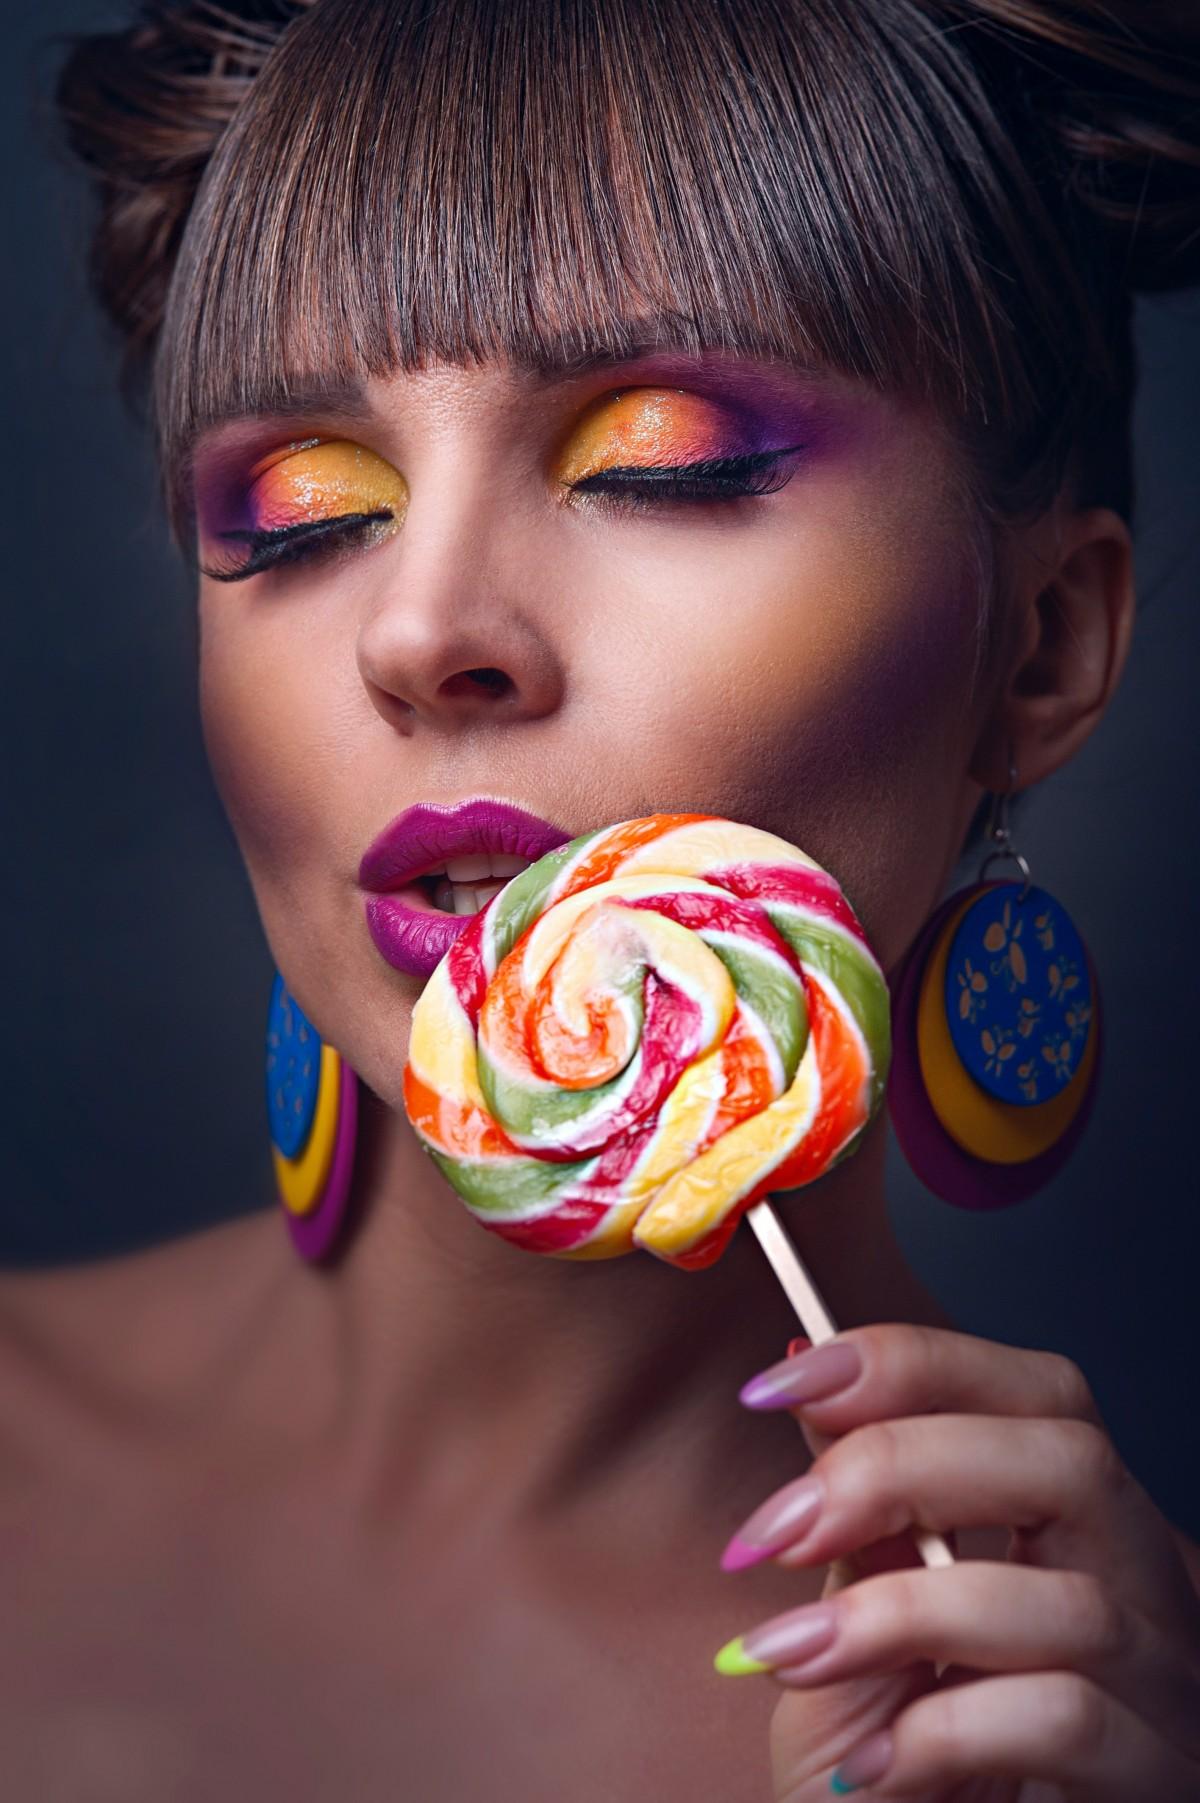 beautiful_beauty_candy_colorful_colourful_cute_earrings_eyeshadow-1550459.jpgd.jfif.jpeg